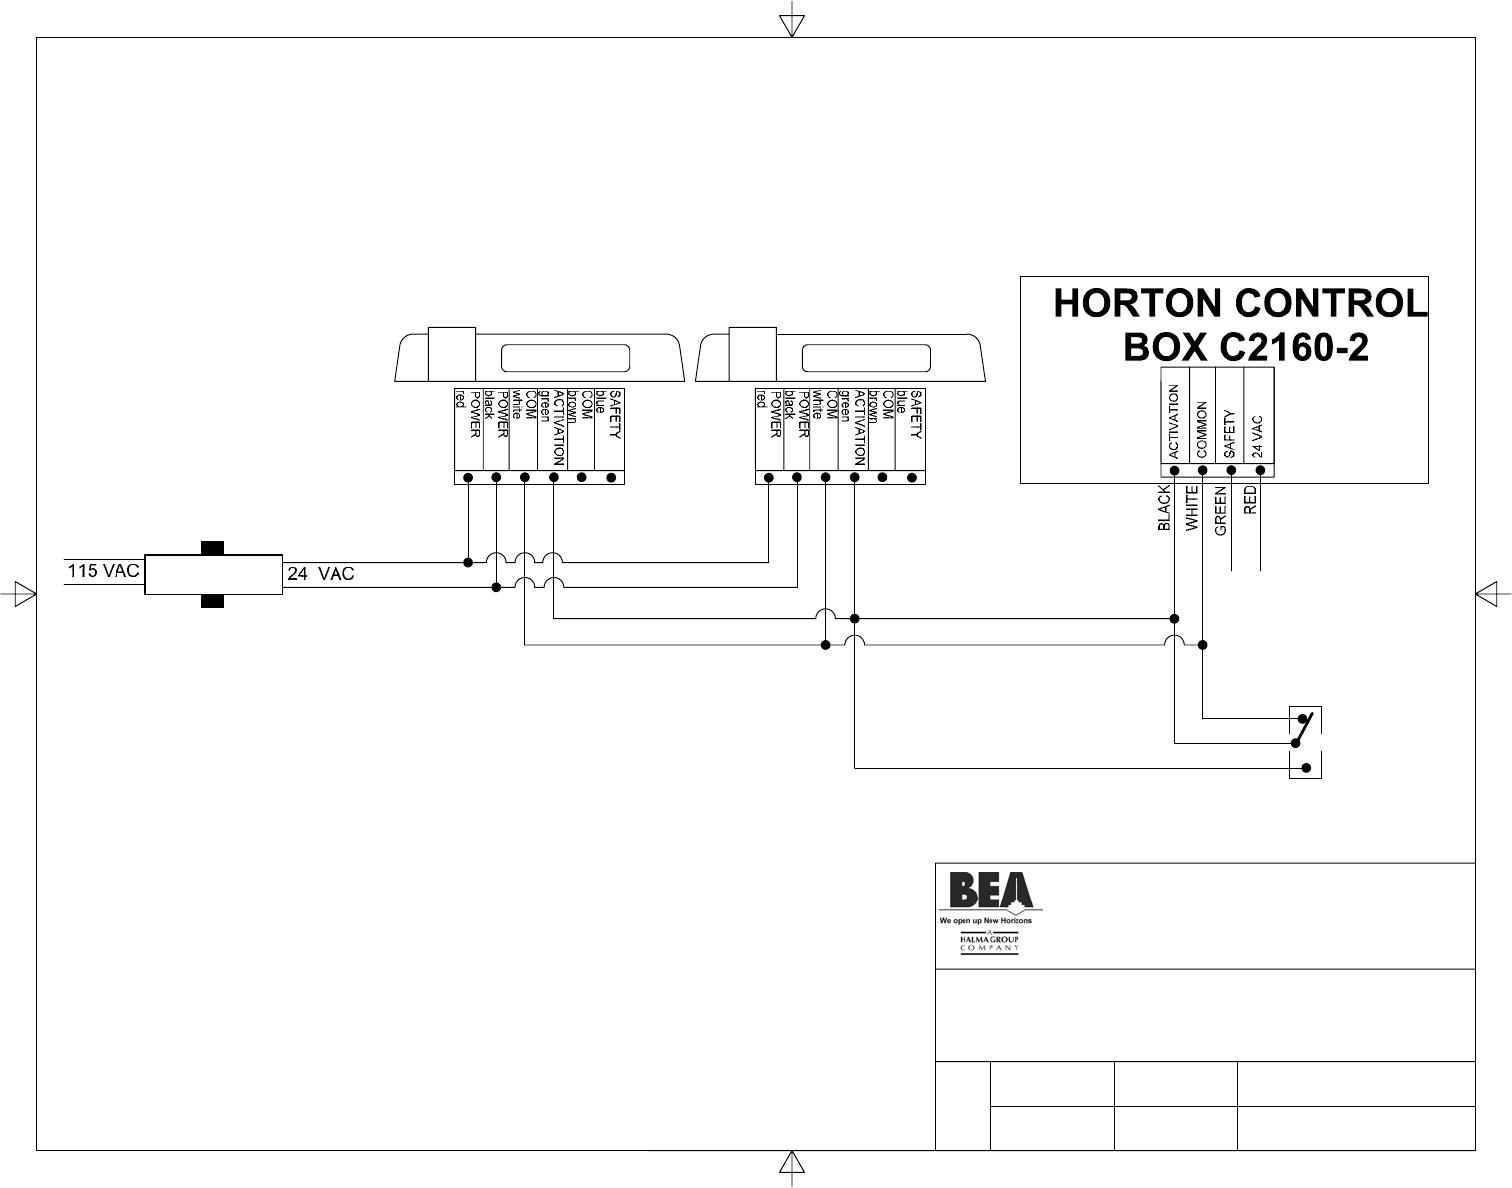 horton c2150 wiring diagram 1996 dodge caravan trailer door operator diagrams 36